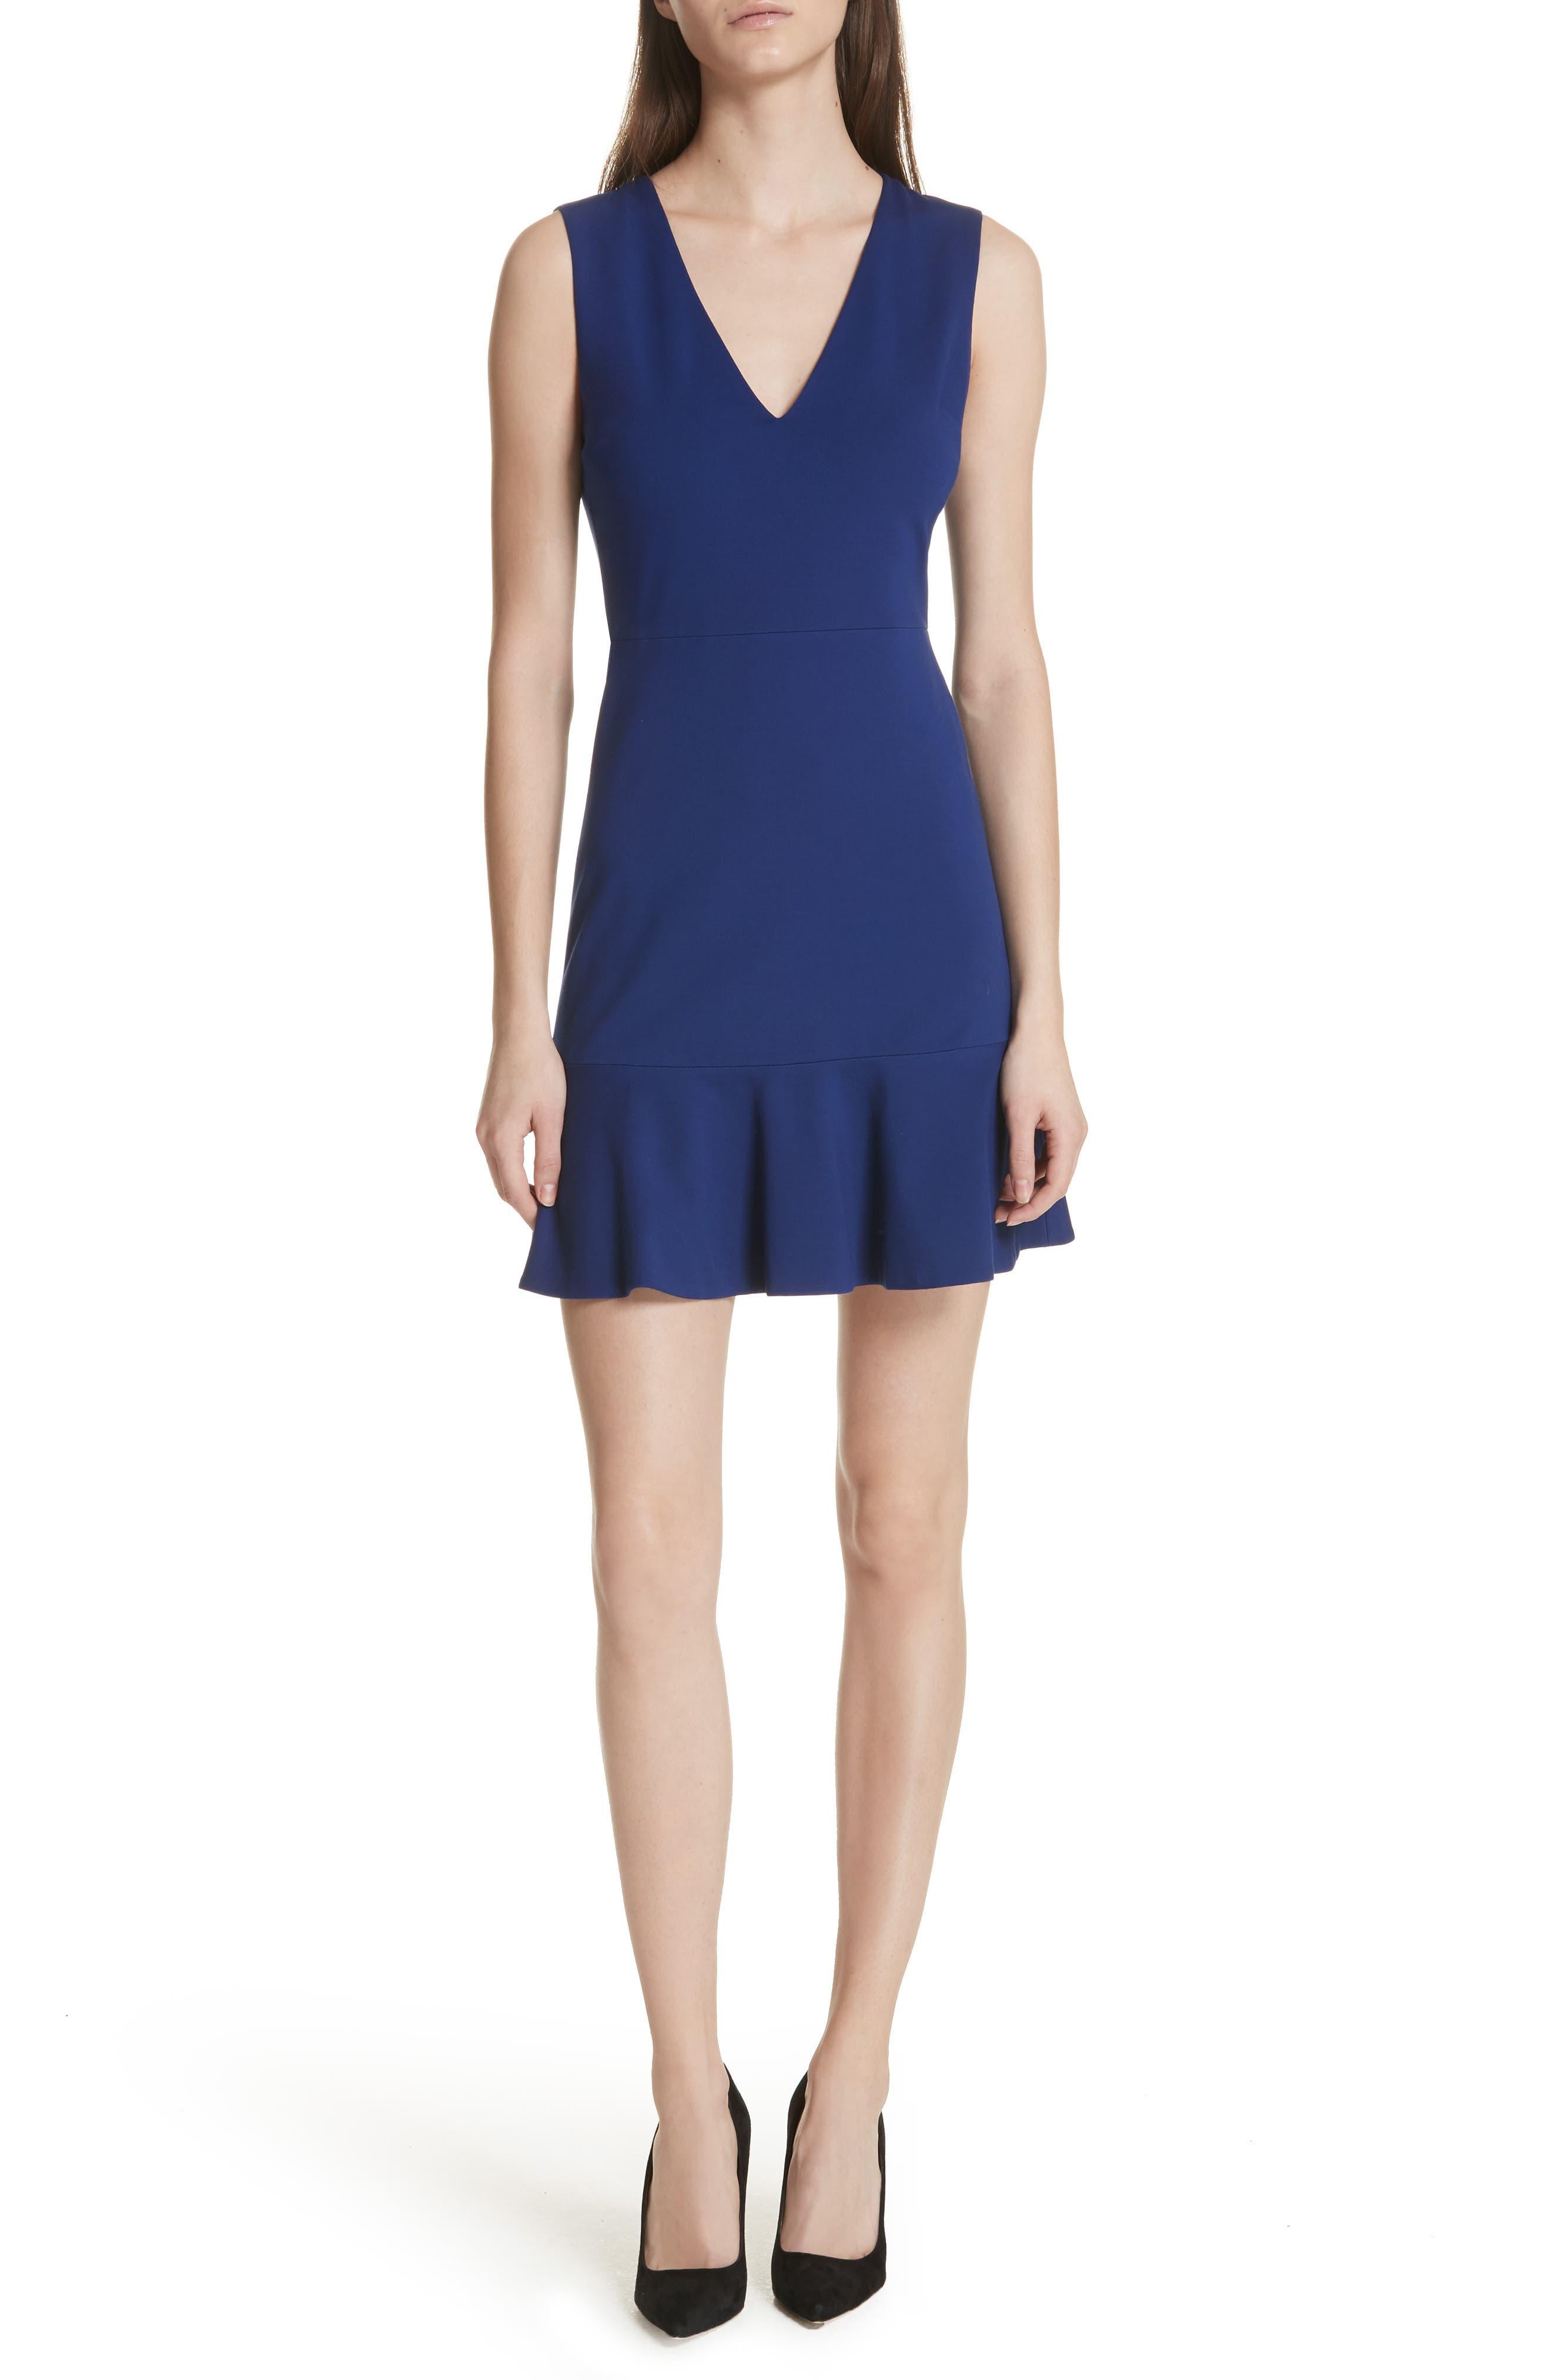 Alternate Image 1 Selected - Alice + Olivia Onella Peplum Hem Fit & Flare Dress